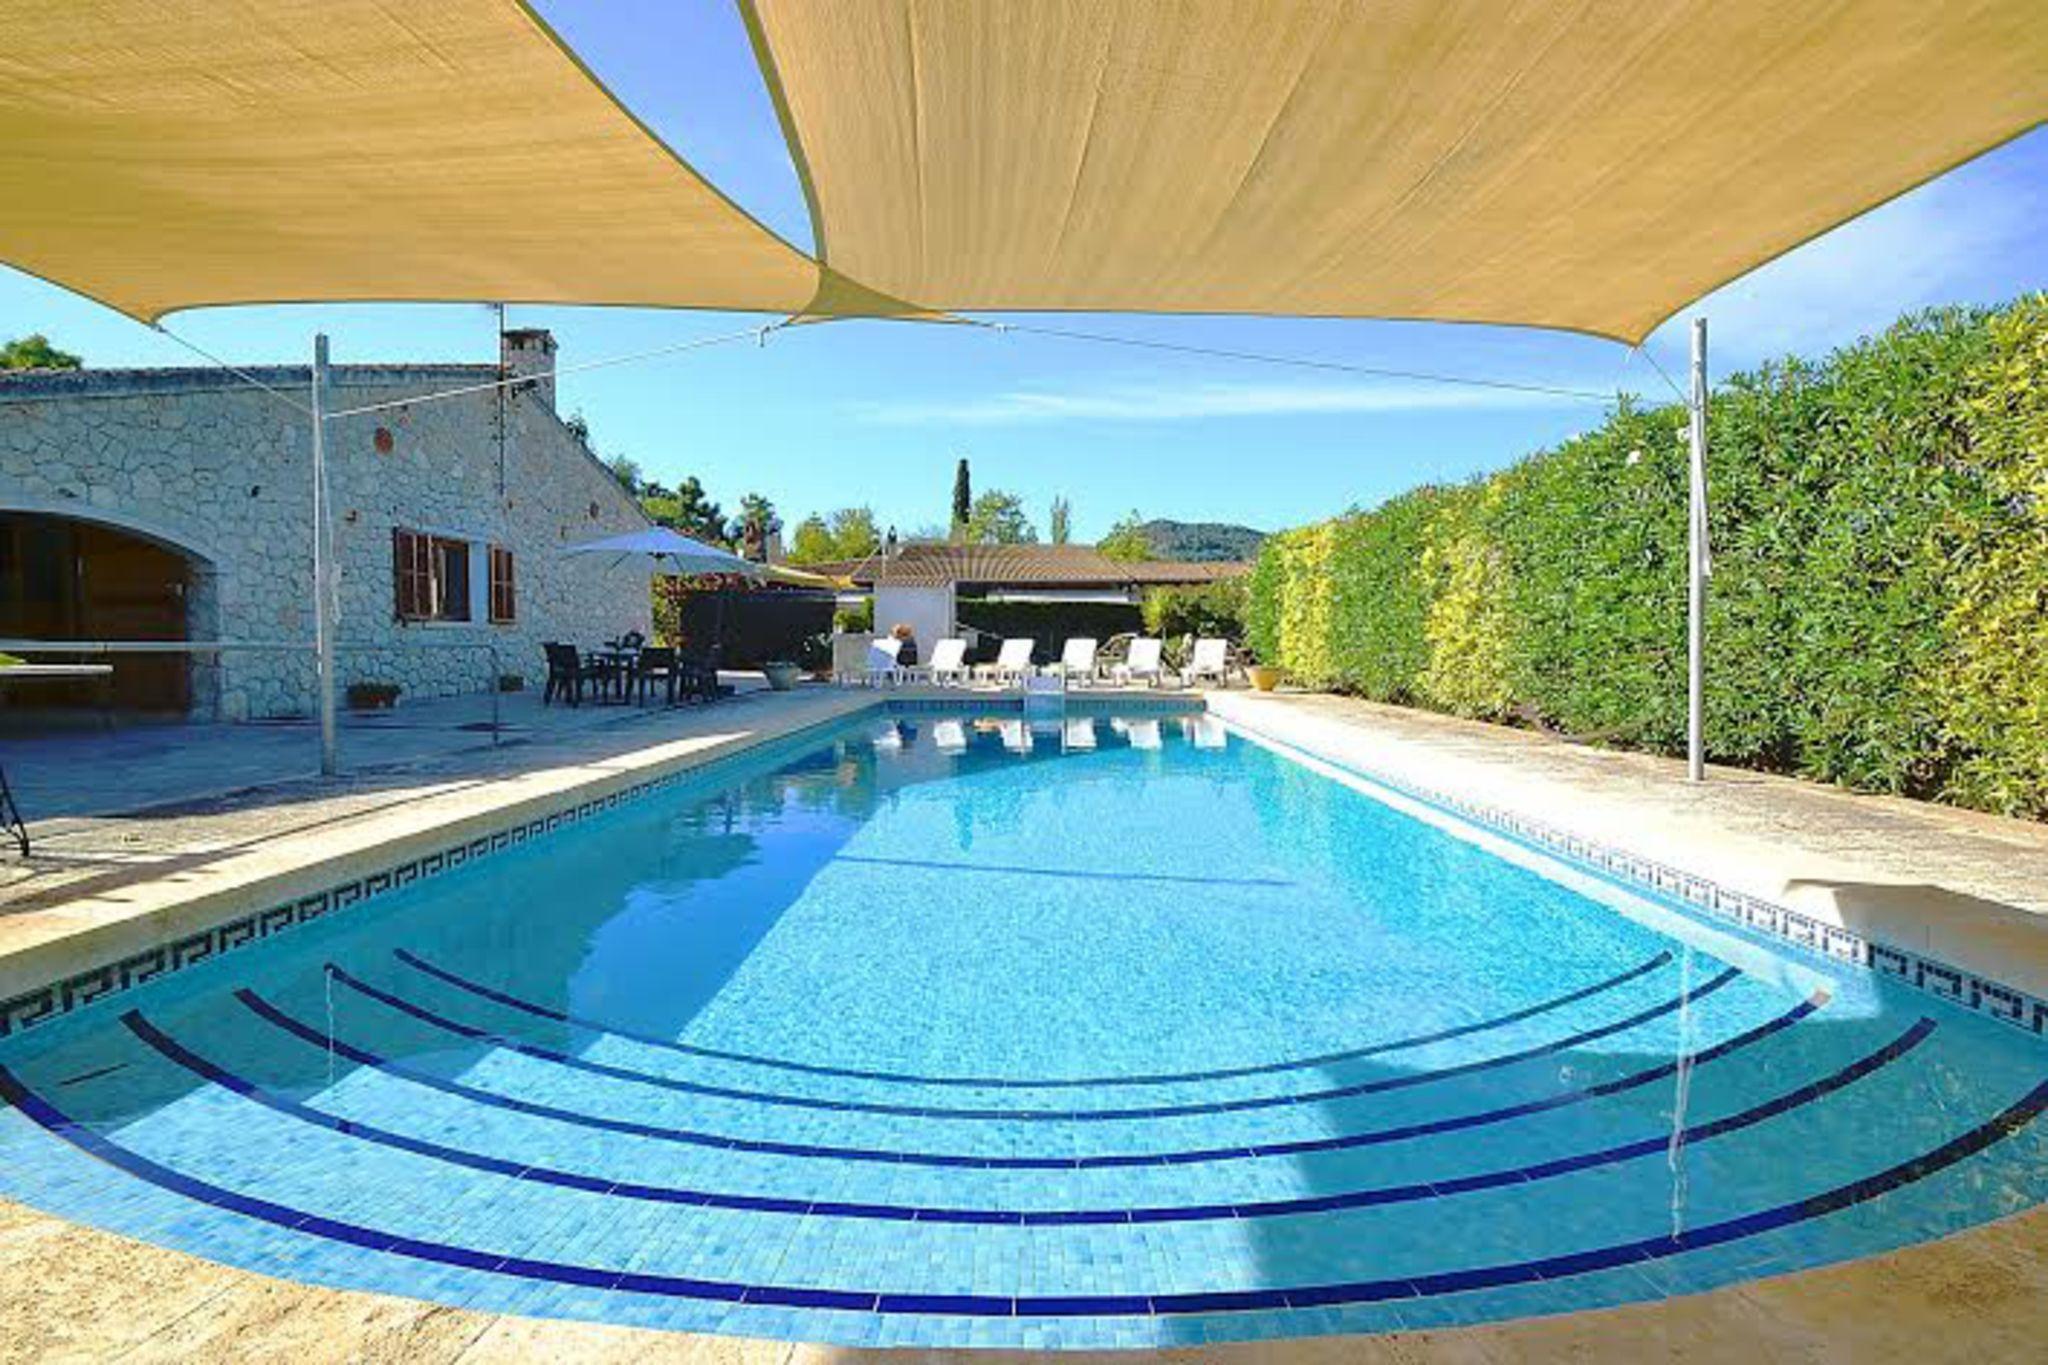 Residencia con piscina en Binissalem